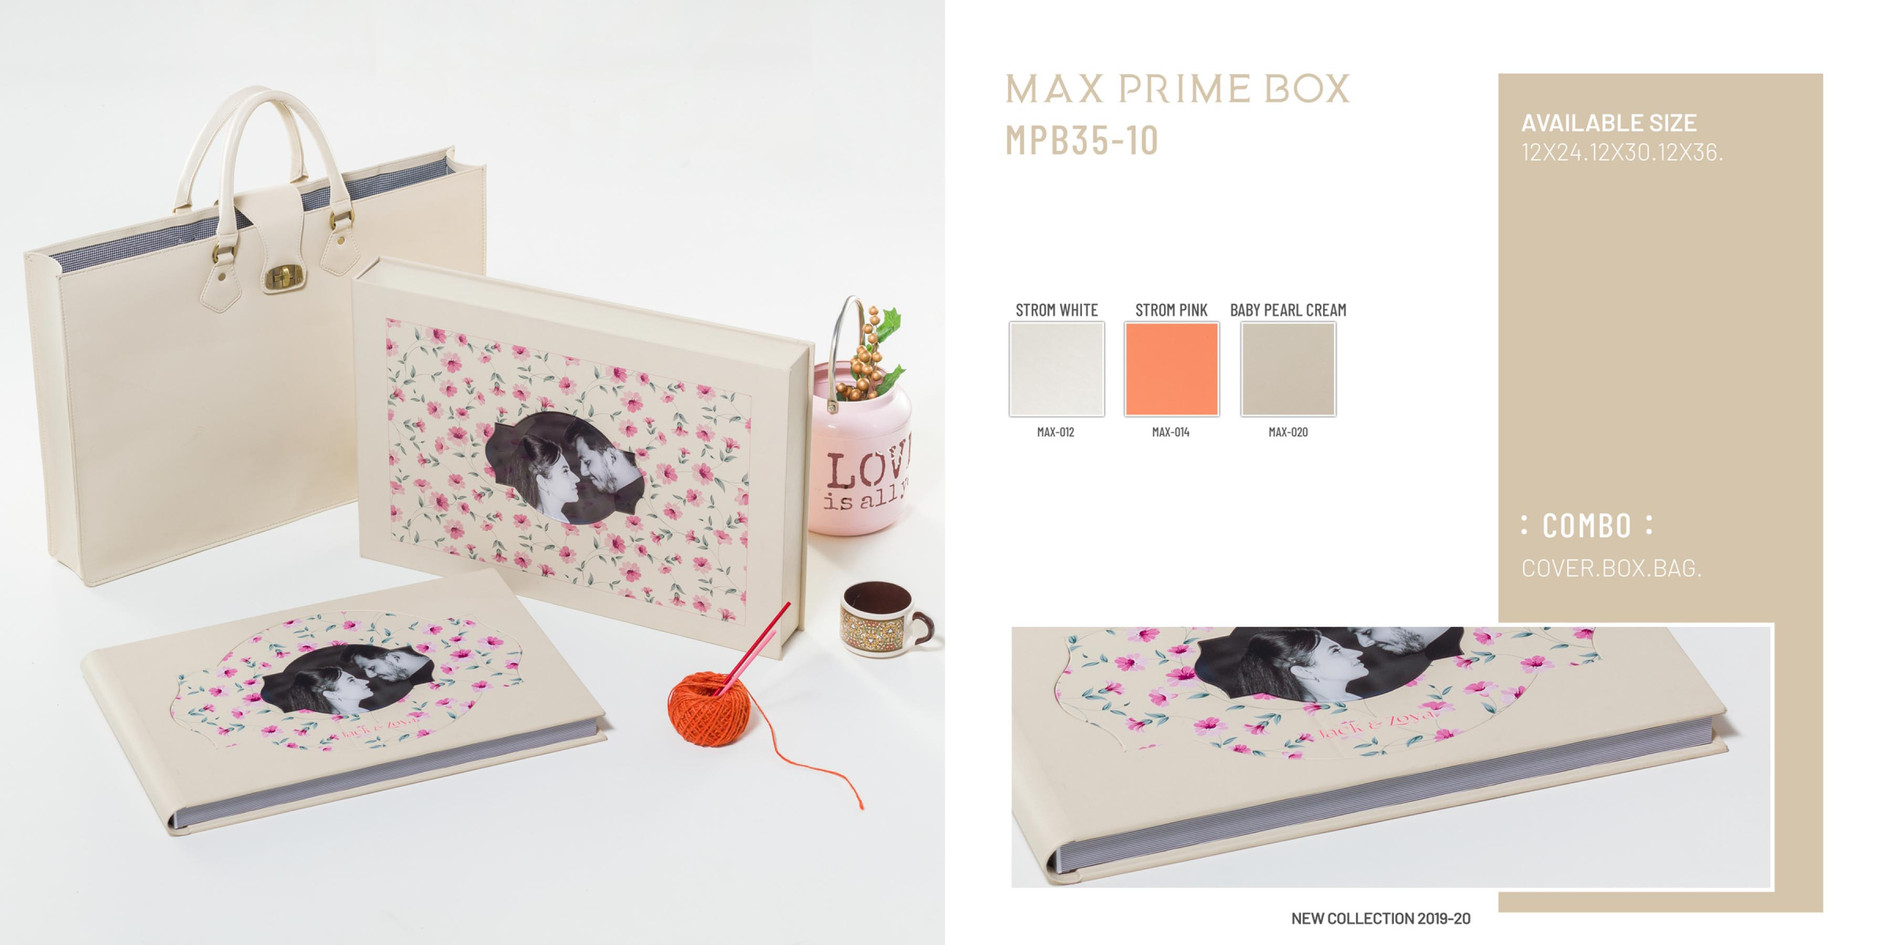 Max Luxury Combo Product-2019-12